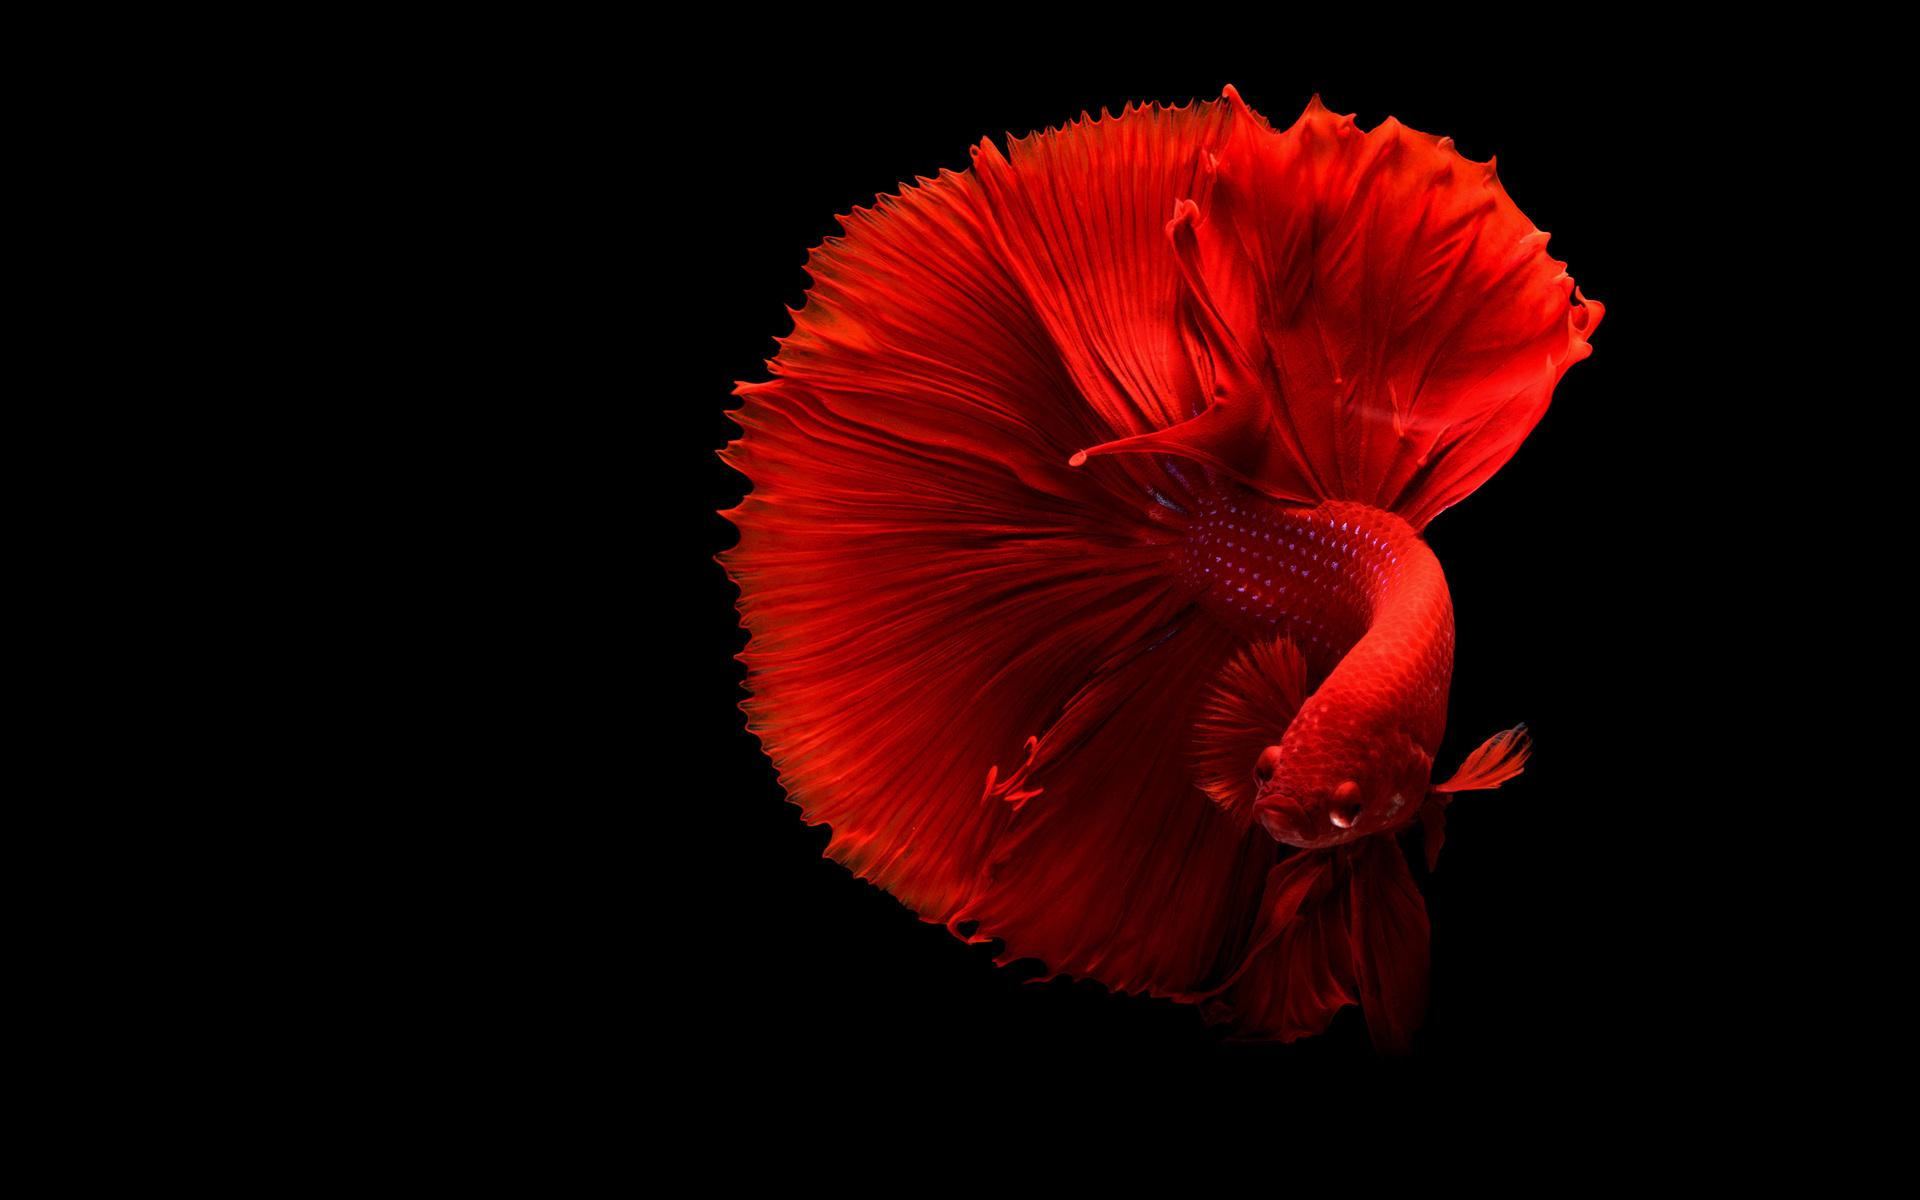 1920x1200 siamese fighting fish 4k 1080p resolution hd 4k wallpaperssiamese fighting fish 4k p5 jpg